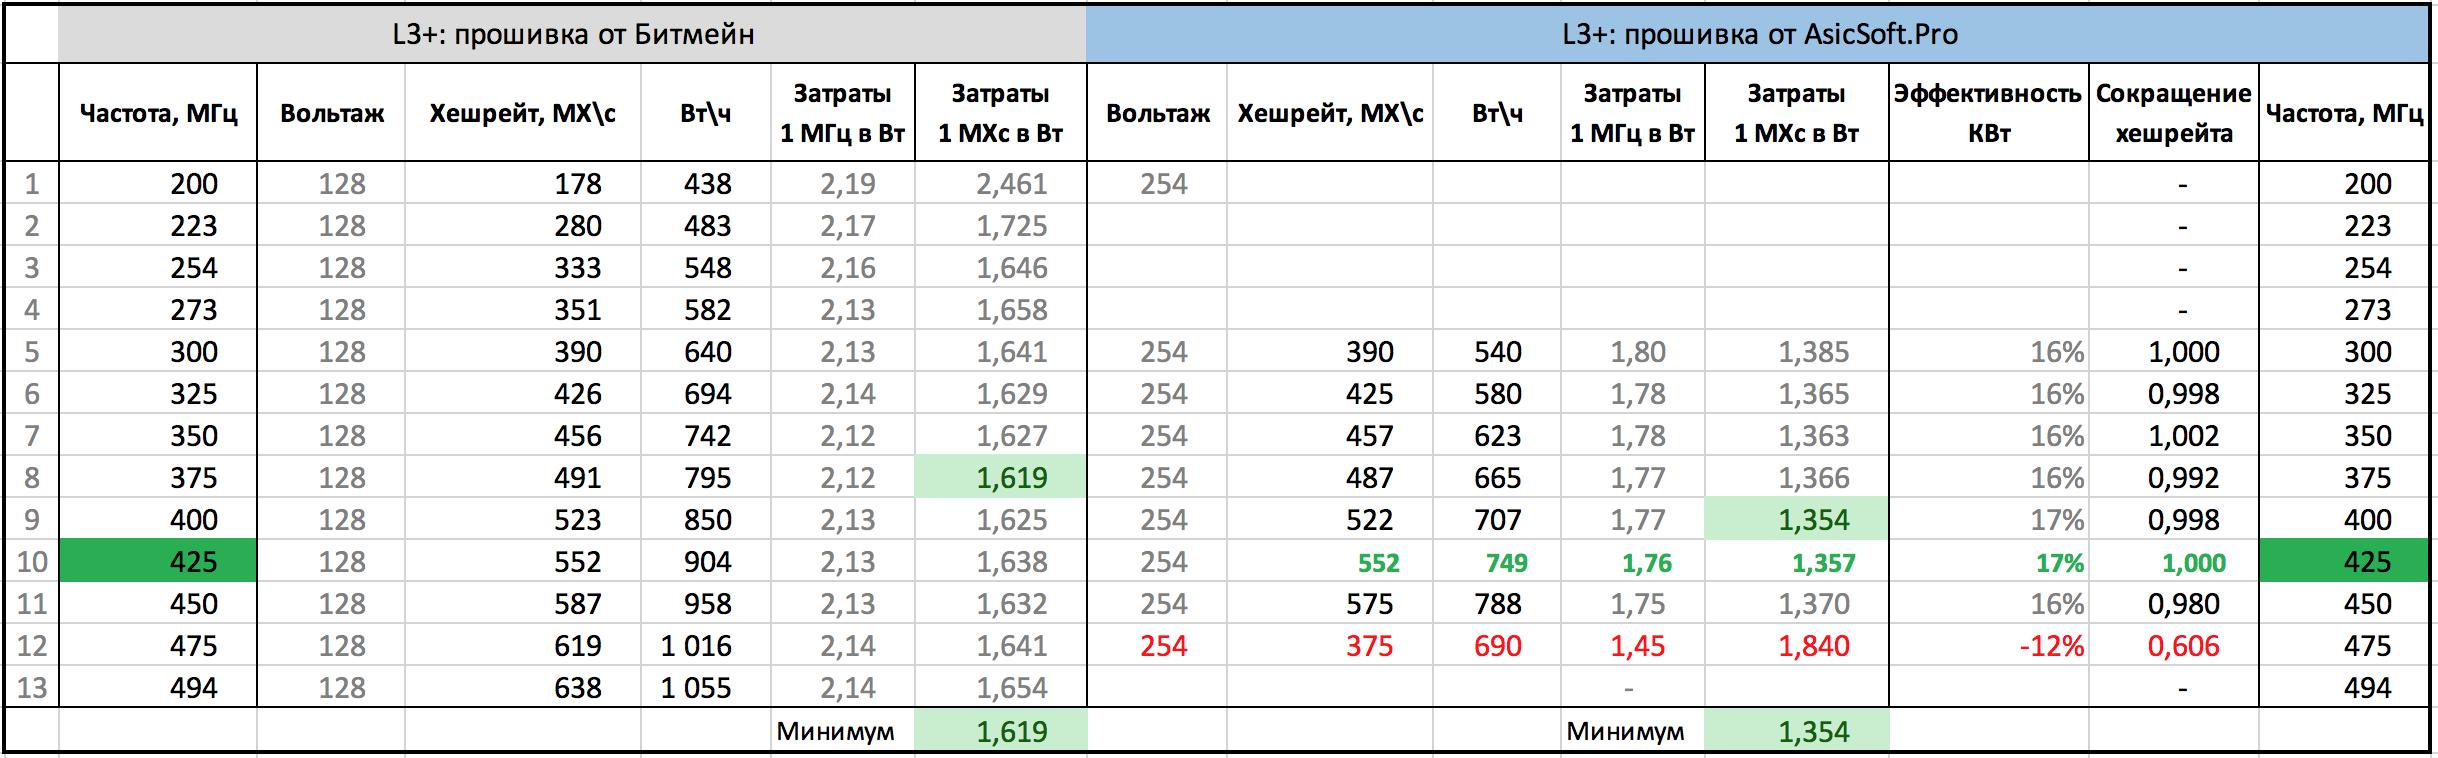 Альтернативная прошивка Antminer L3 - без отчислений